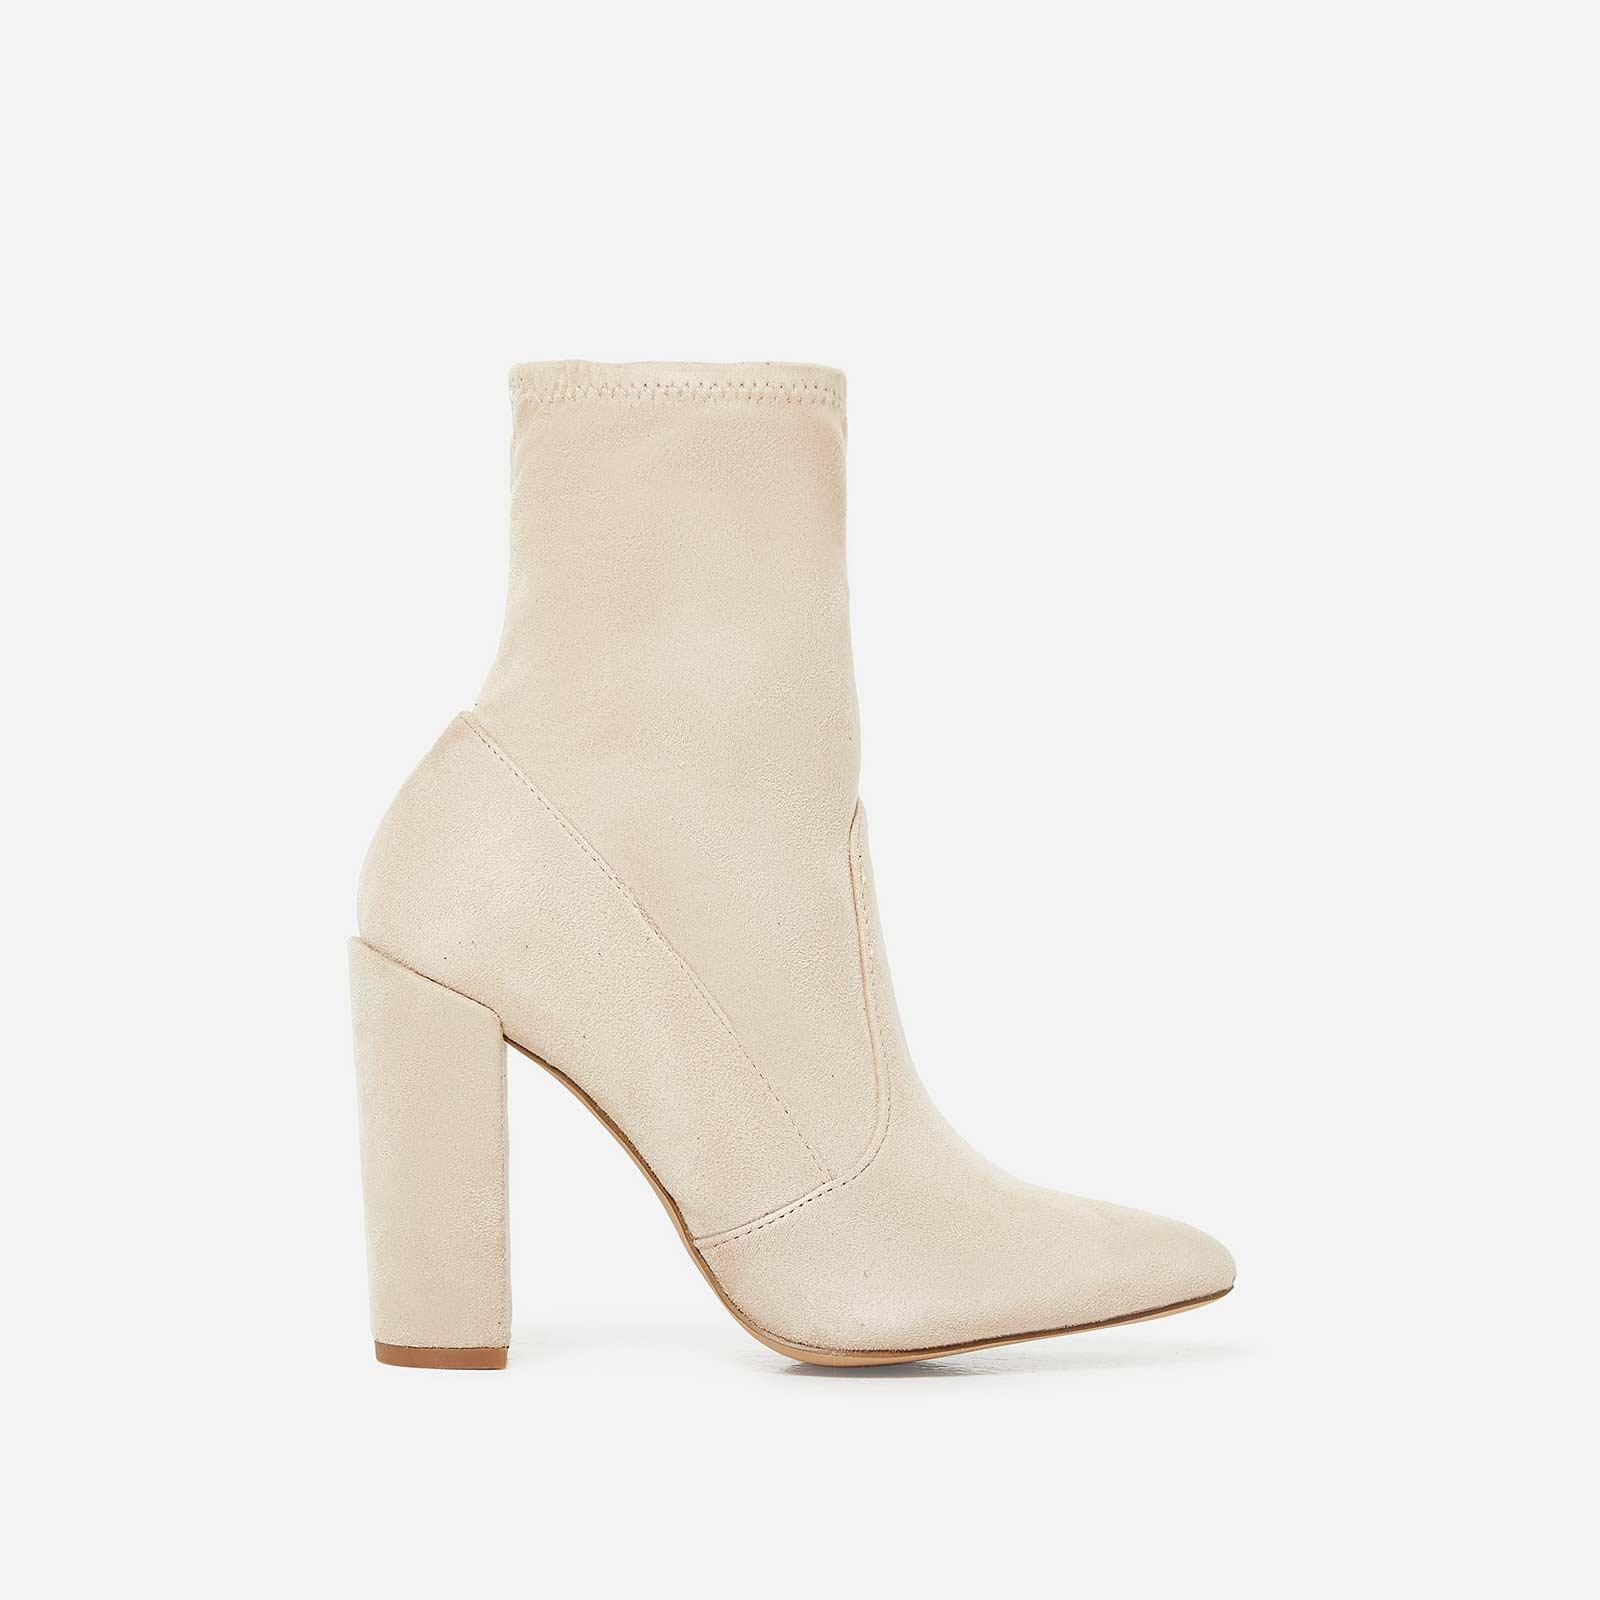 Avery Block Heel Sock Boot In Nude Faux Suede